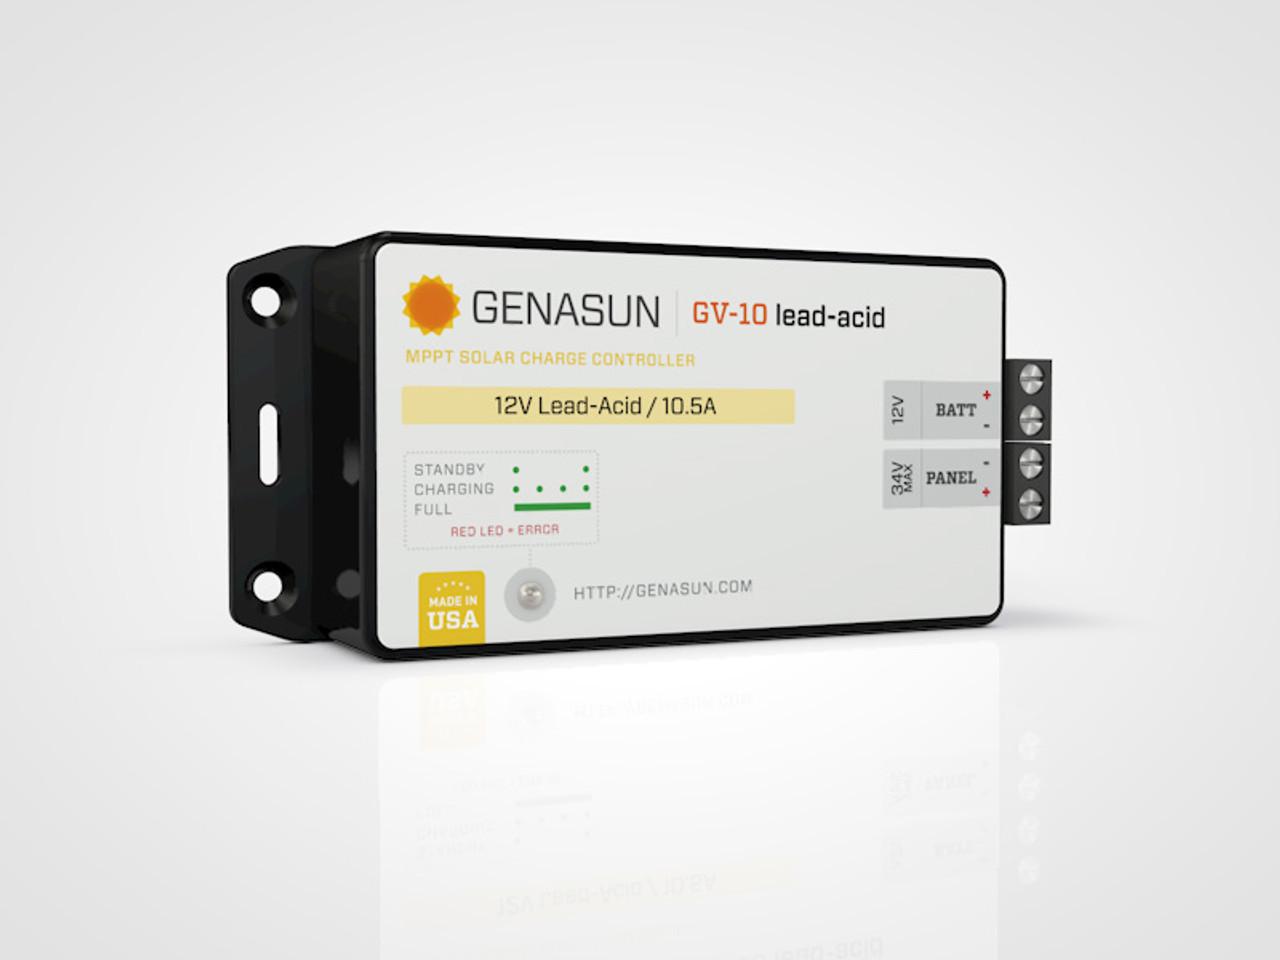 GV-10 | 140W 10.5A Genasun MPPT Solar Charge Controller - Pb - Left1